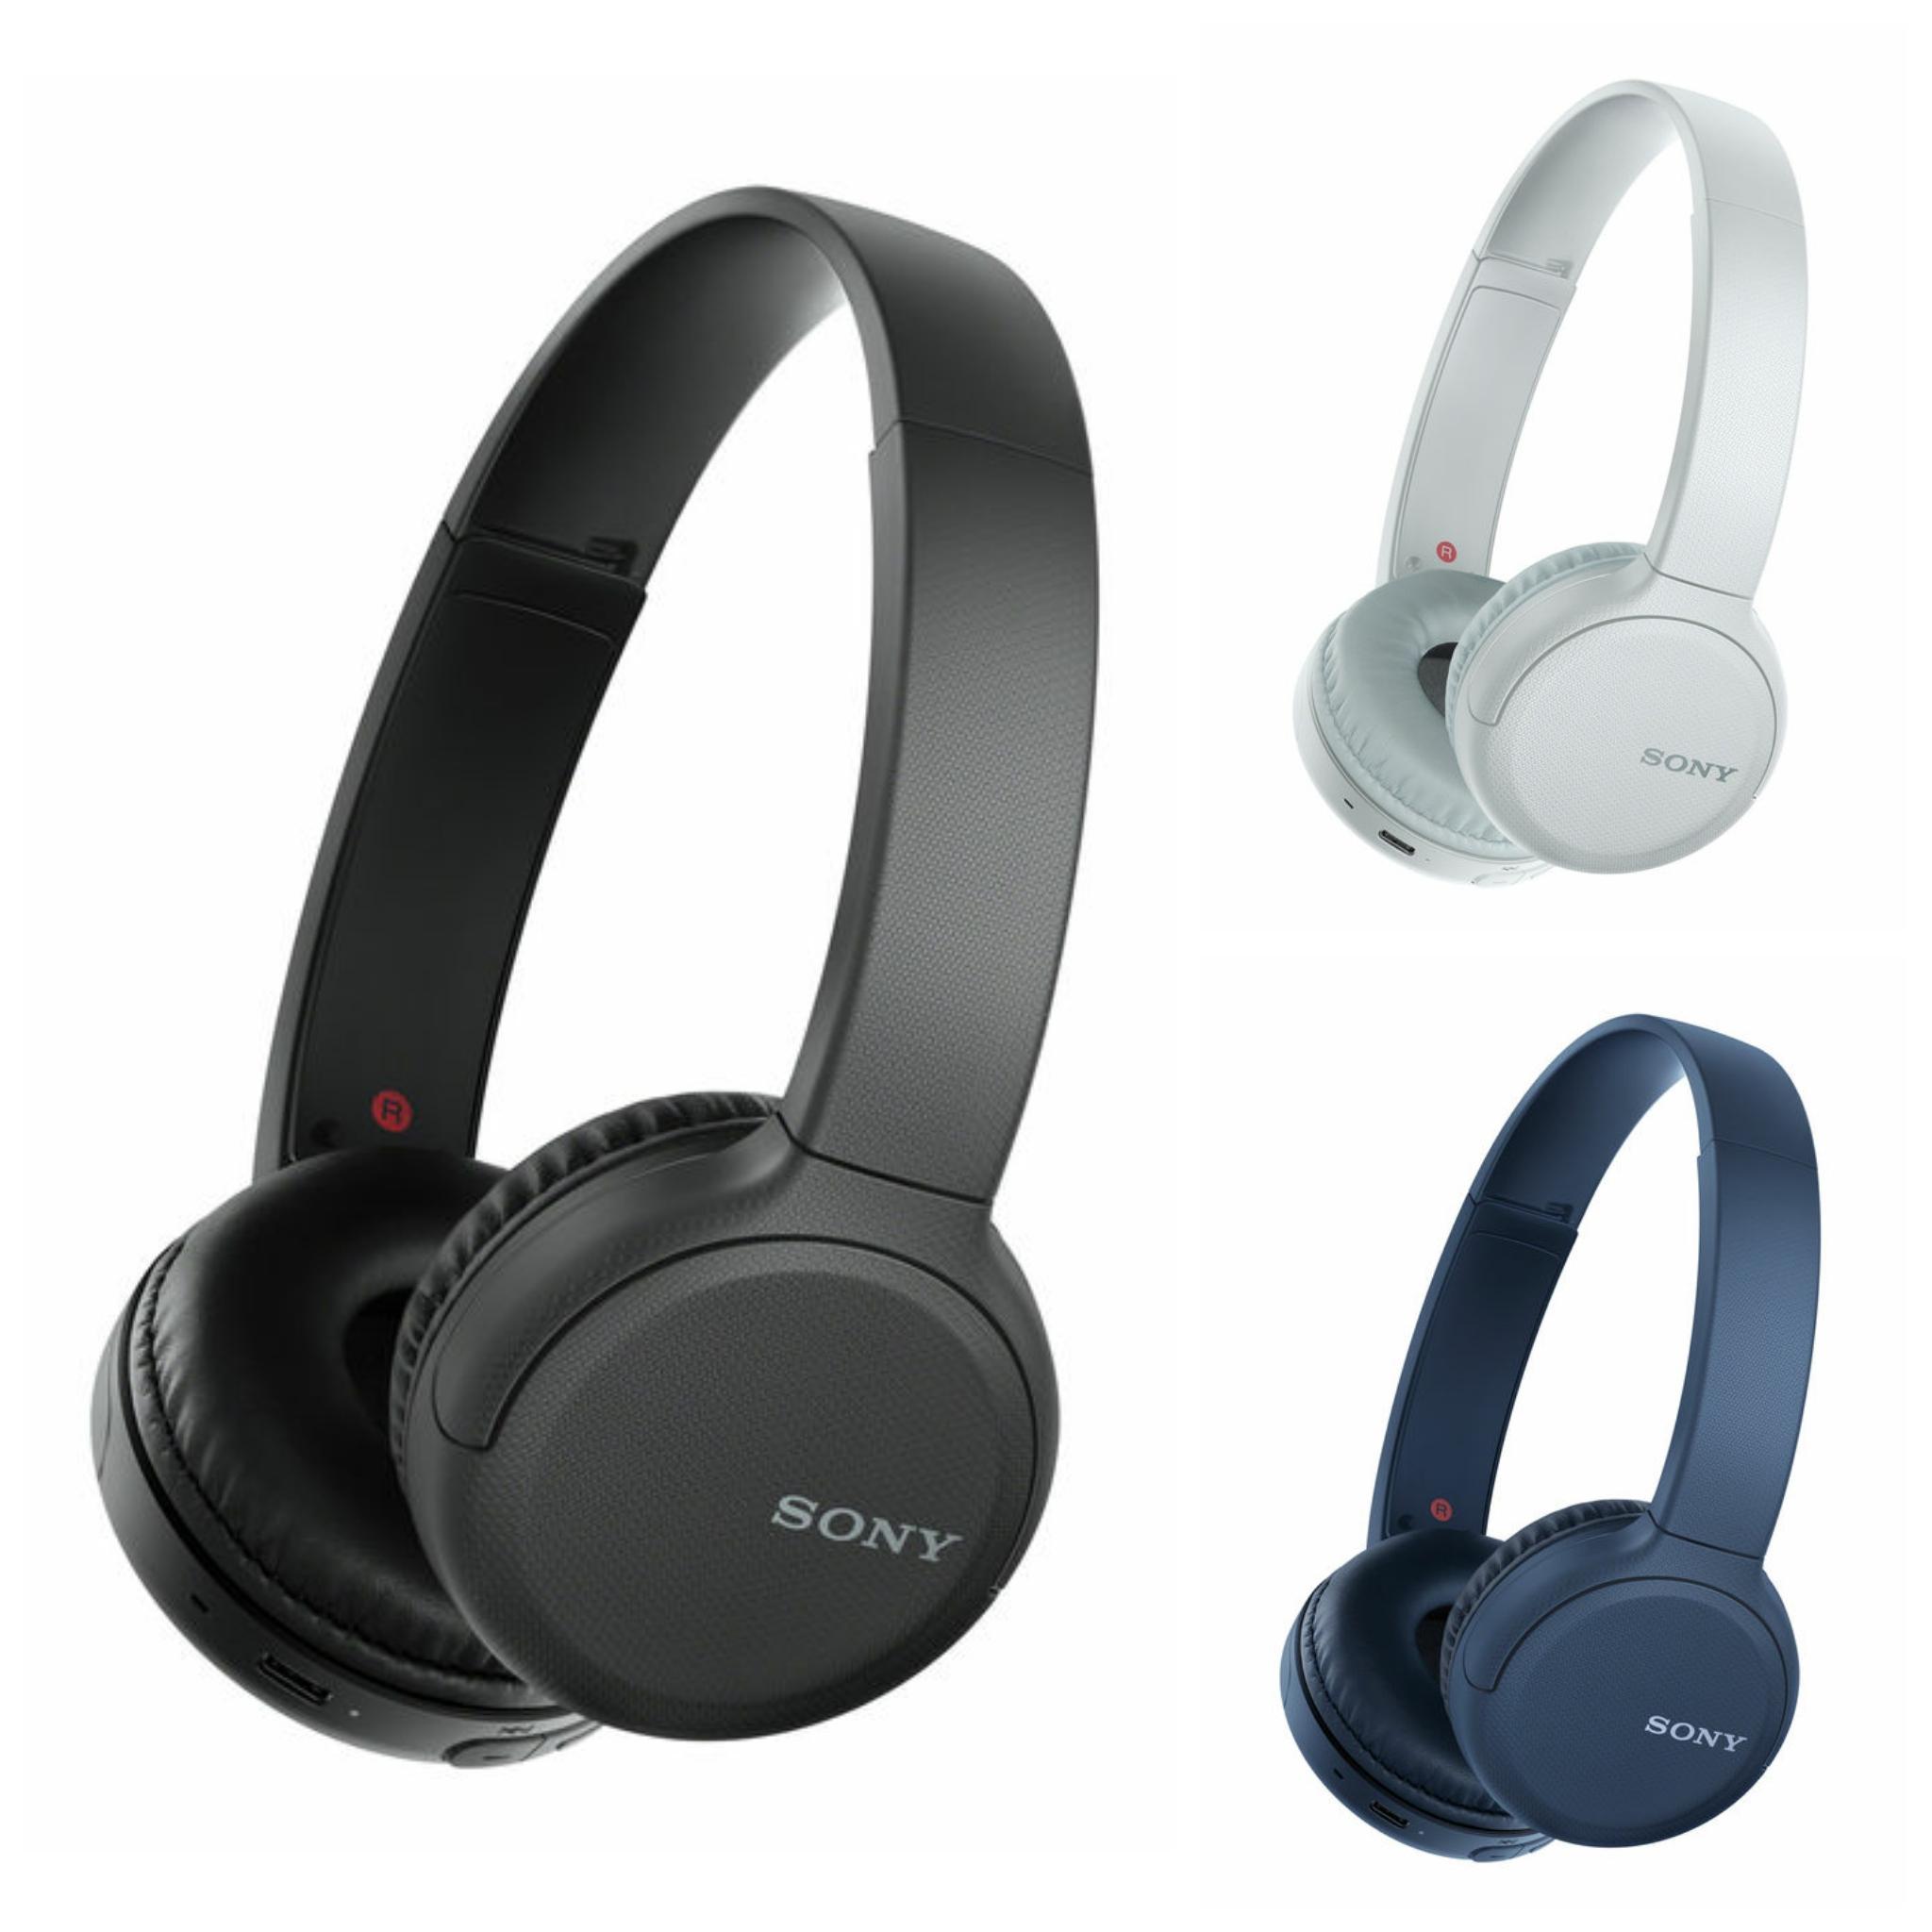 Sony Cuffie Bluetooth con microfono SONY WHCH510 Black